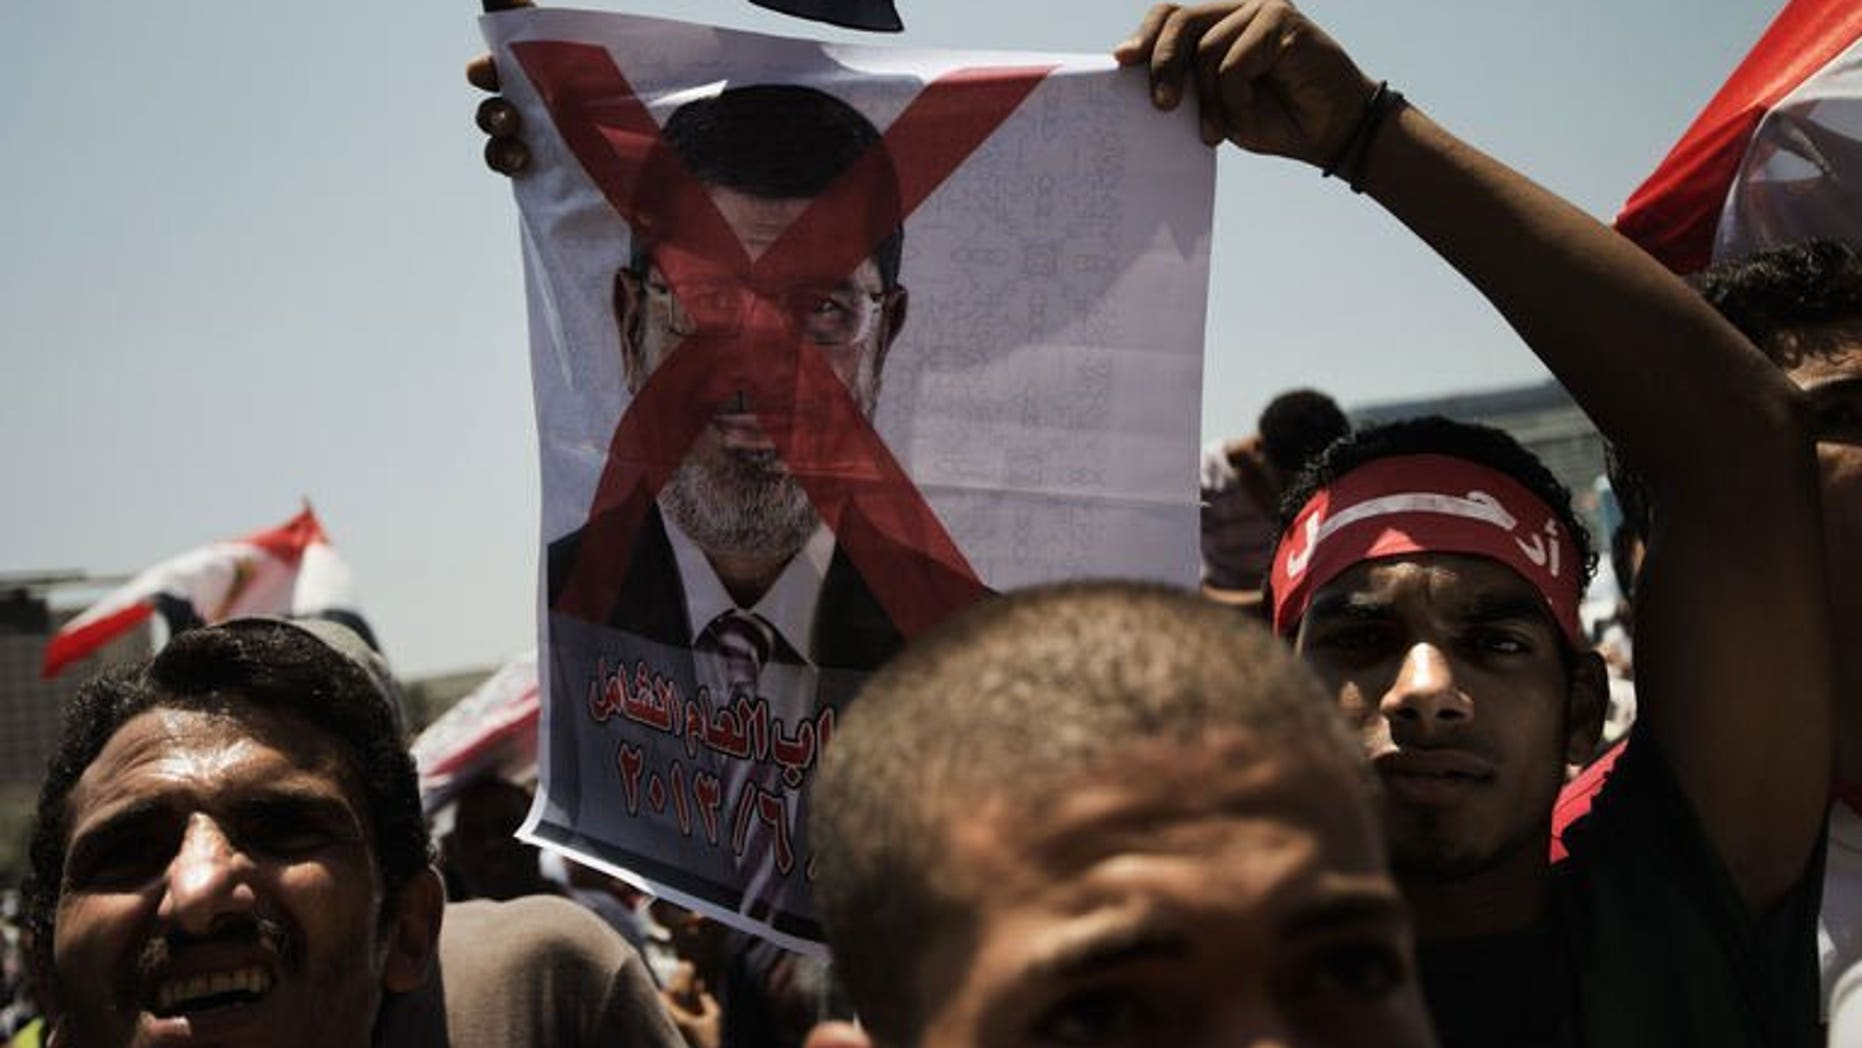 An Egyptian opposition supporter holds a crossed-out picture of President Mohammed Morsi in Cairo's landmark Tahrir Square on June 29, 2013.